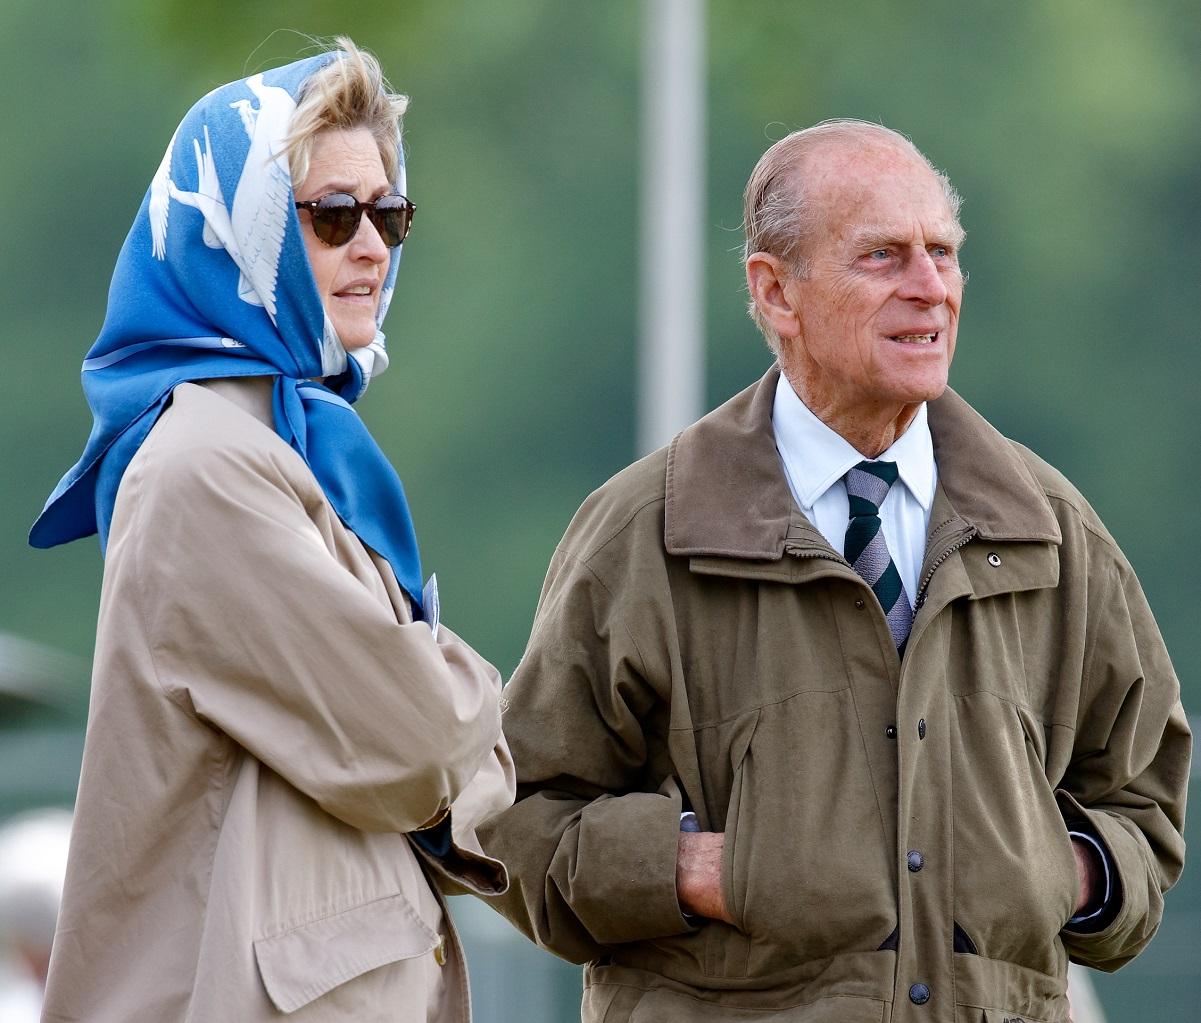 Penelope Knatchbull, Lady Brabourne and Prince Philip, Duke of Edinburgh attend the Royal Windsor Horse Show together